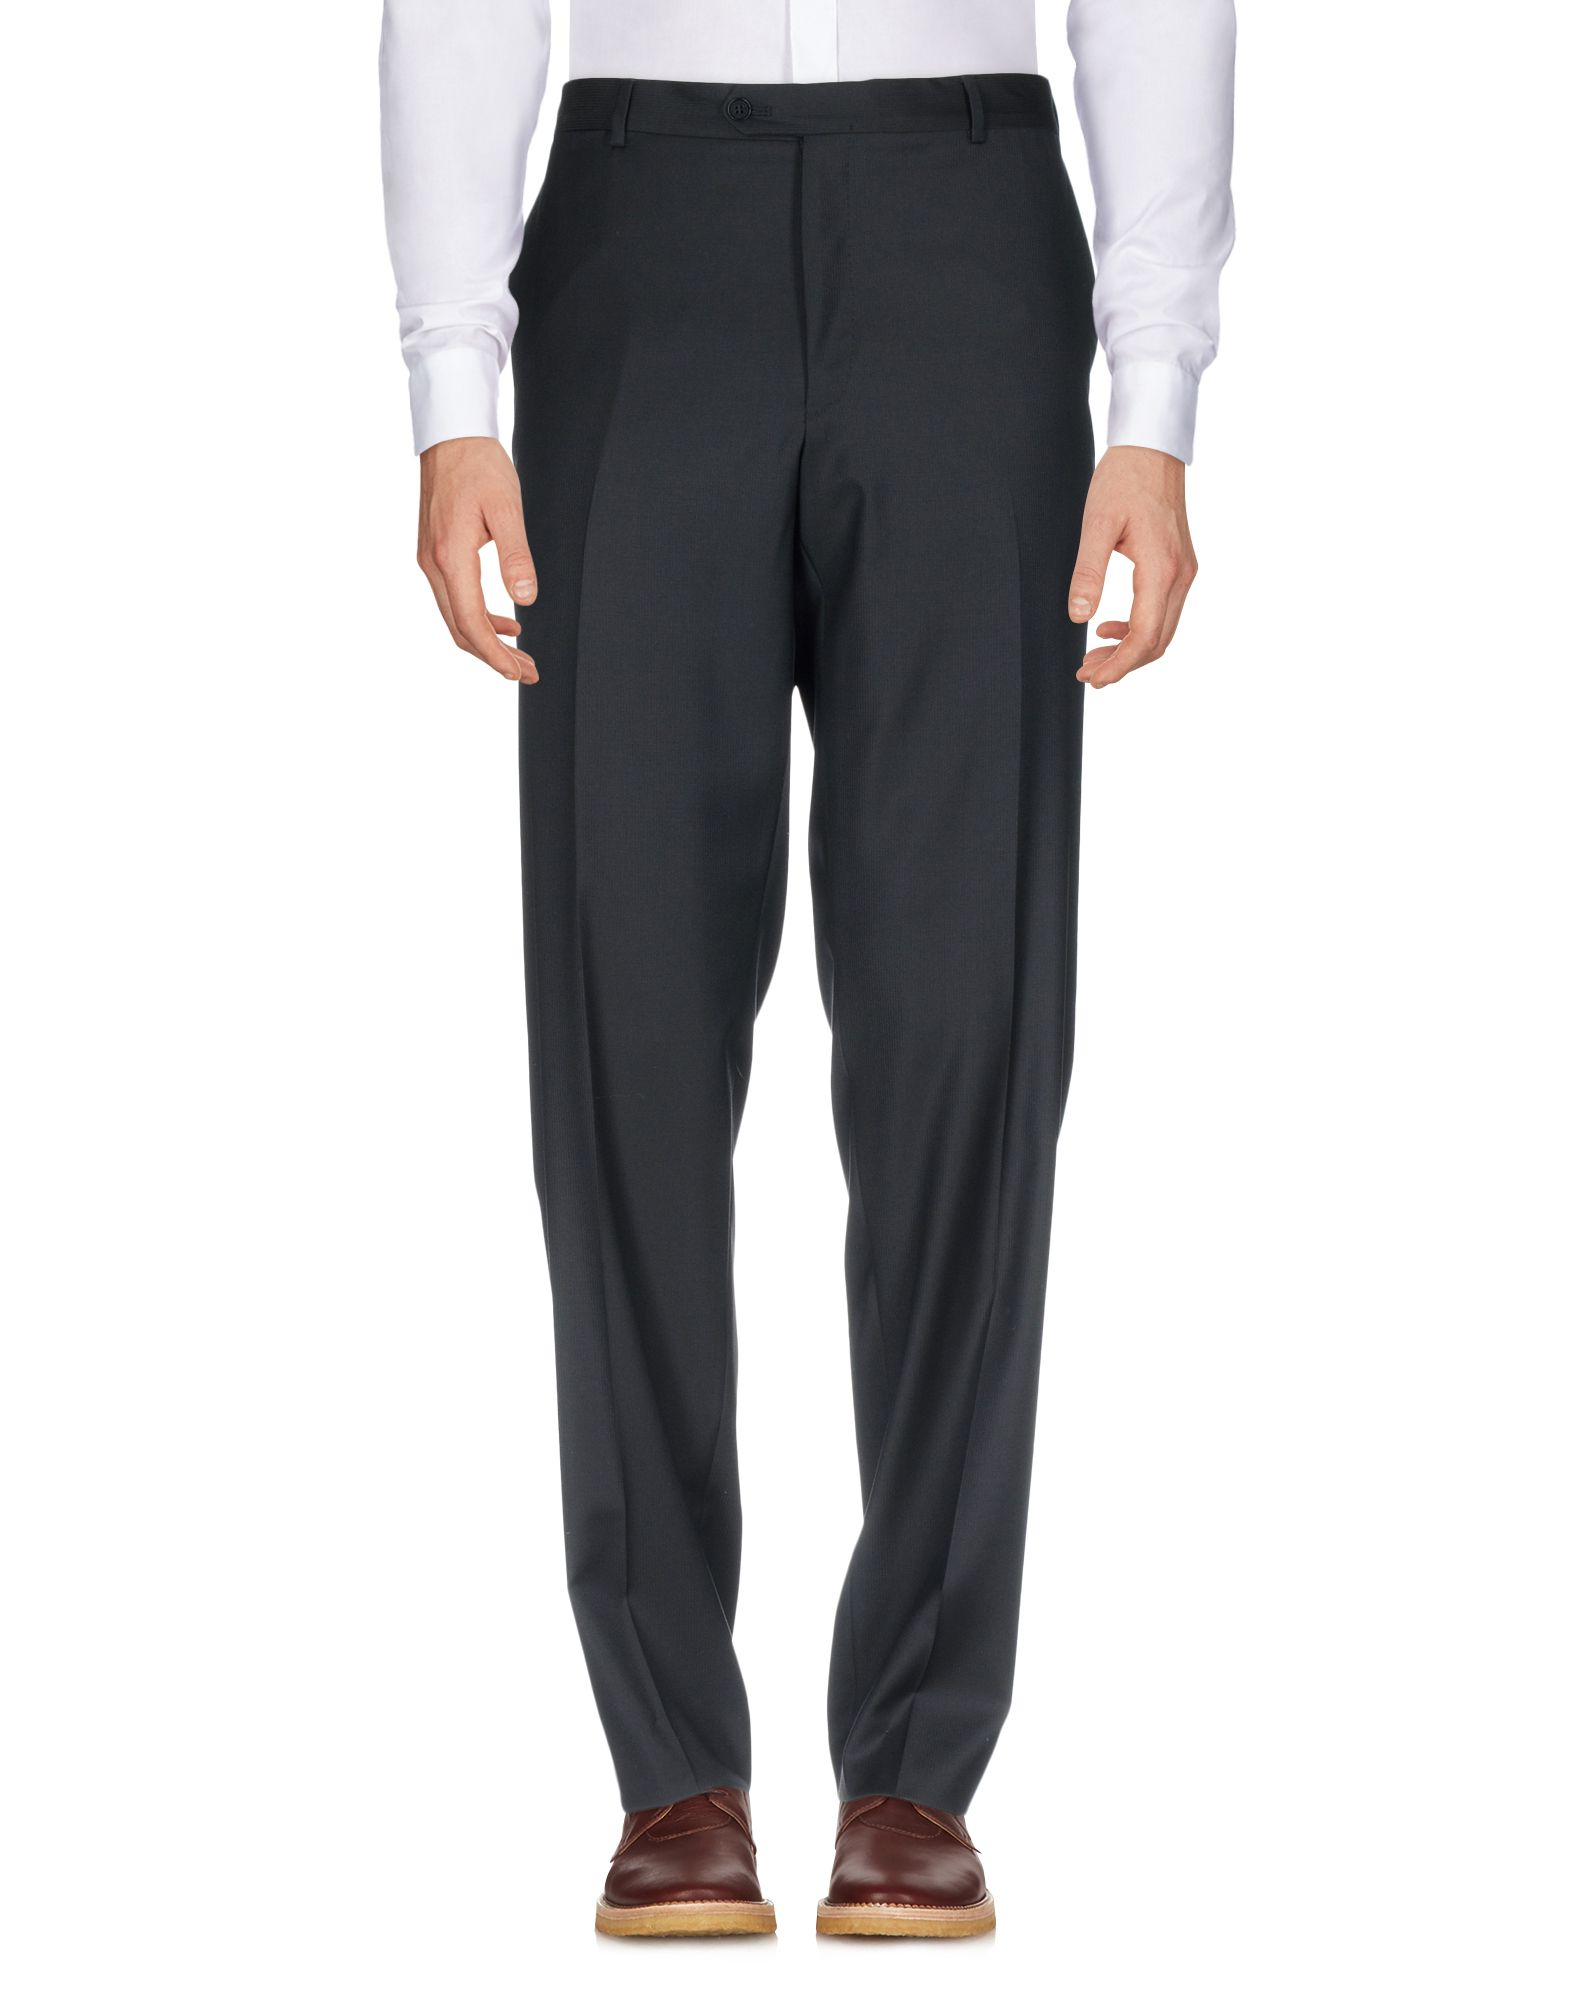 Pantalone Michelangelo Uomo - Acquista online su